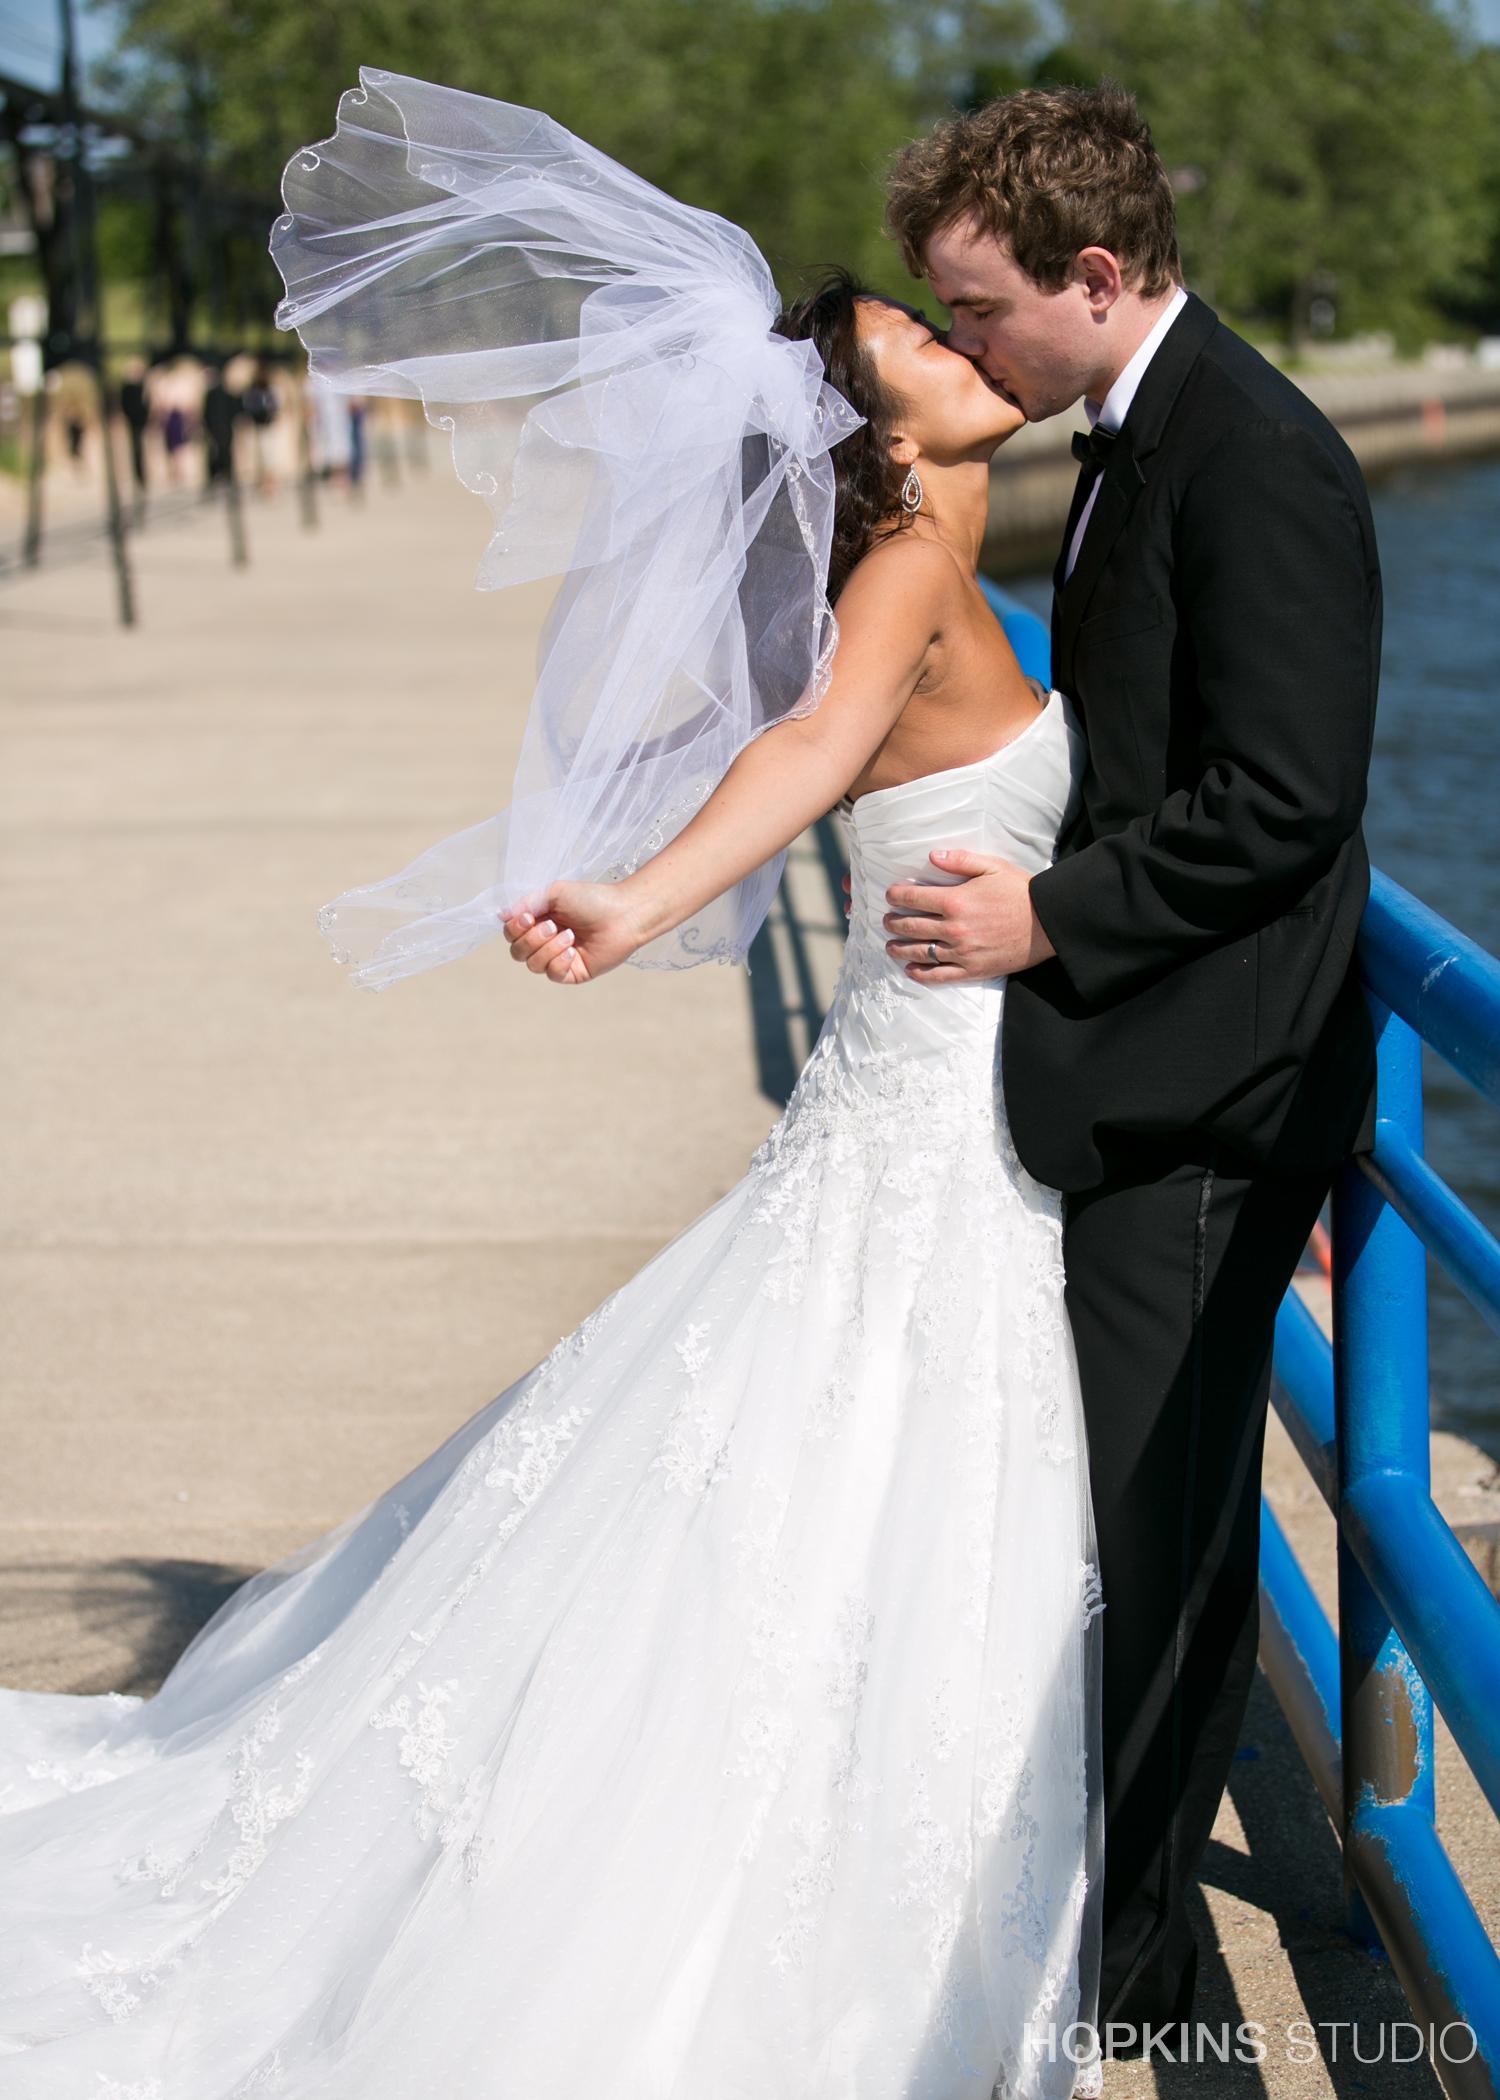 Wedding-Photography-Shadowland-Ballroom-St-Joseph-Southwest-Michigan_69.jpg